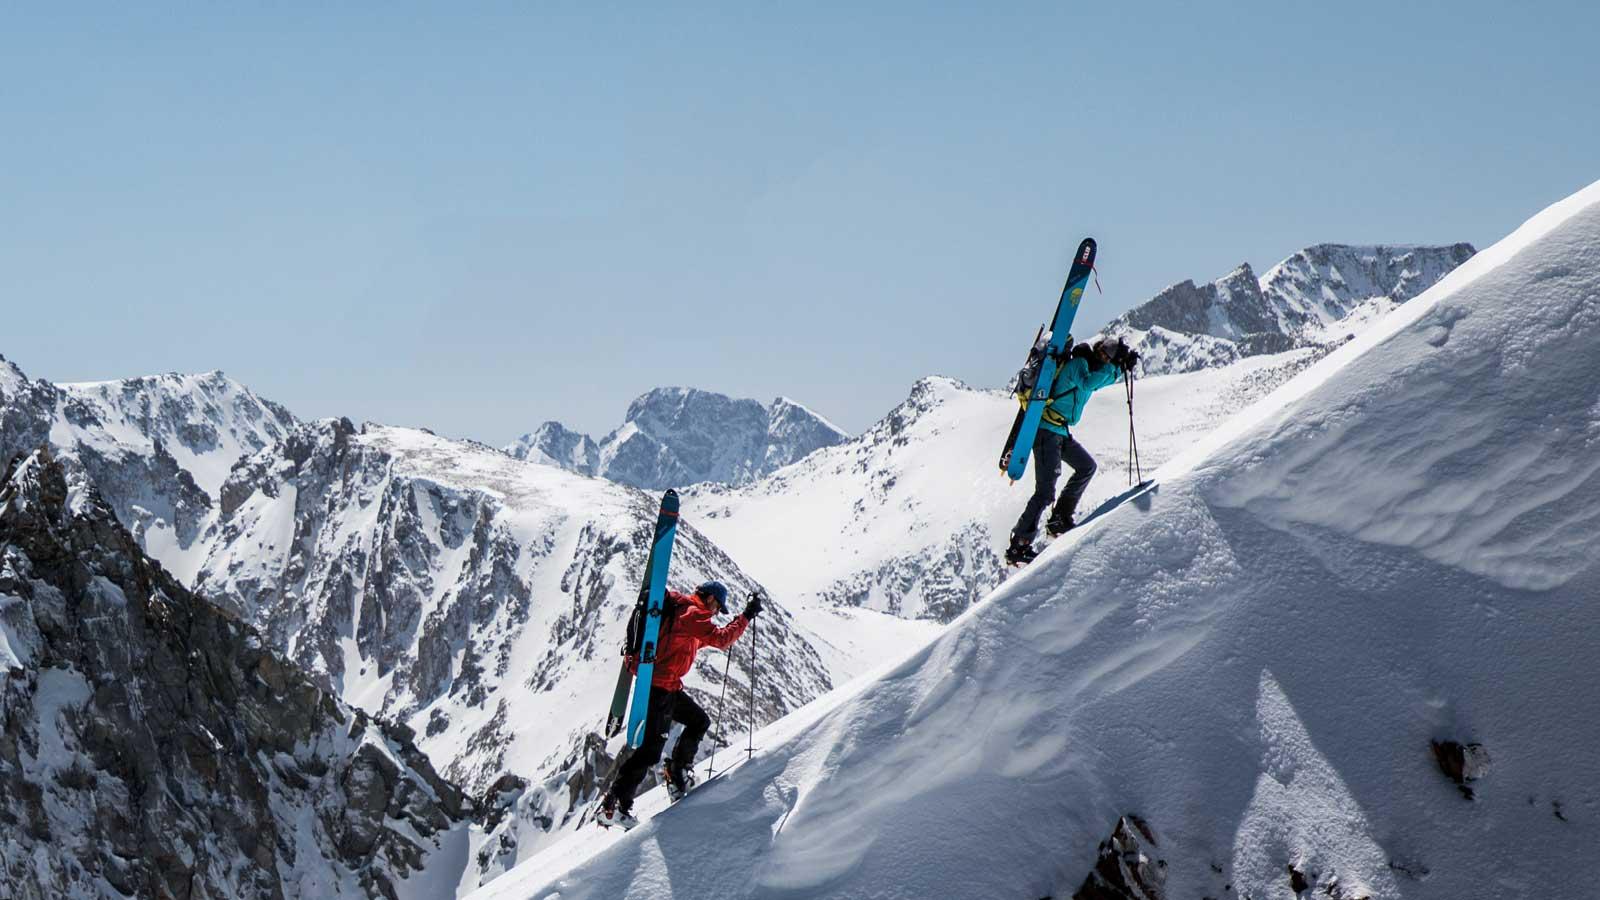 Banff Mountain Film Festival 2021